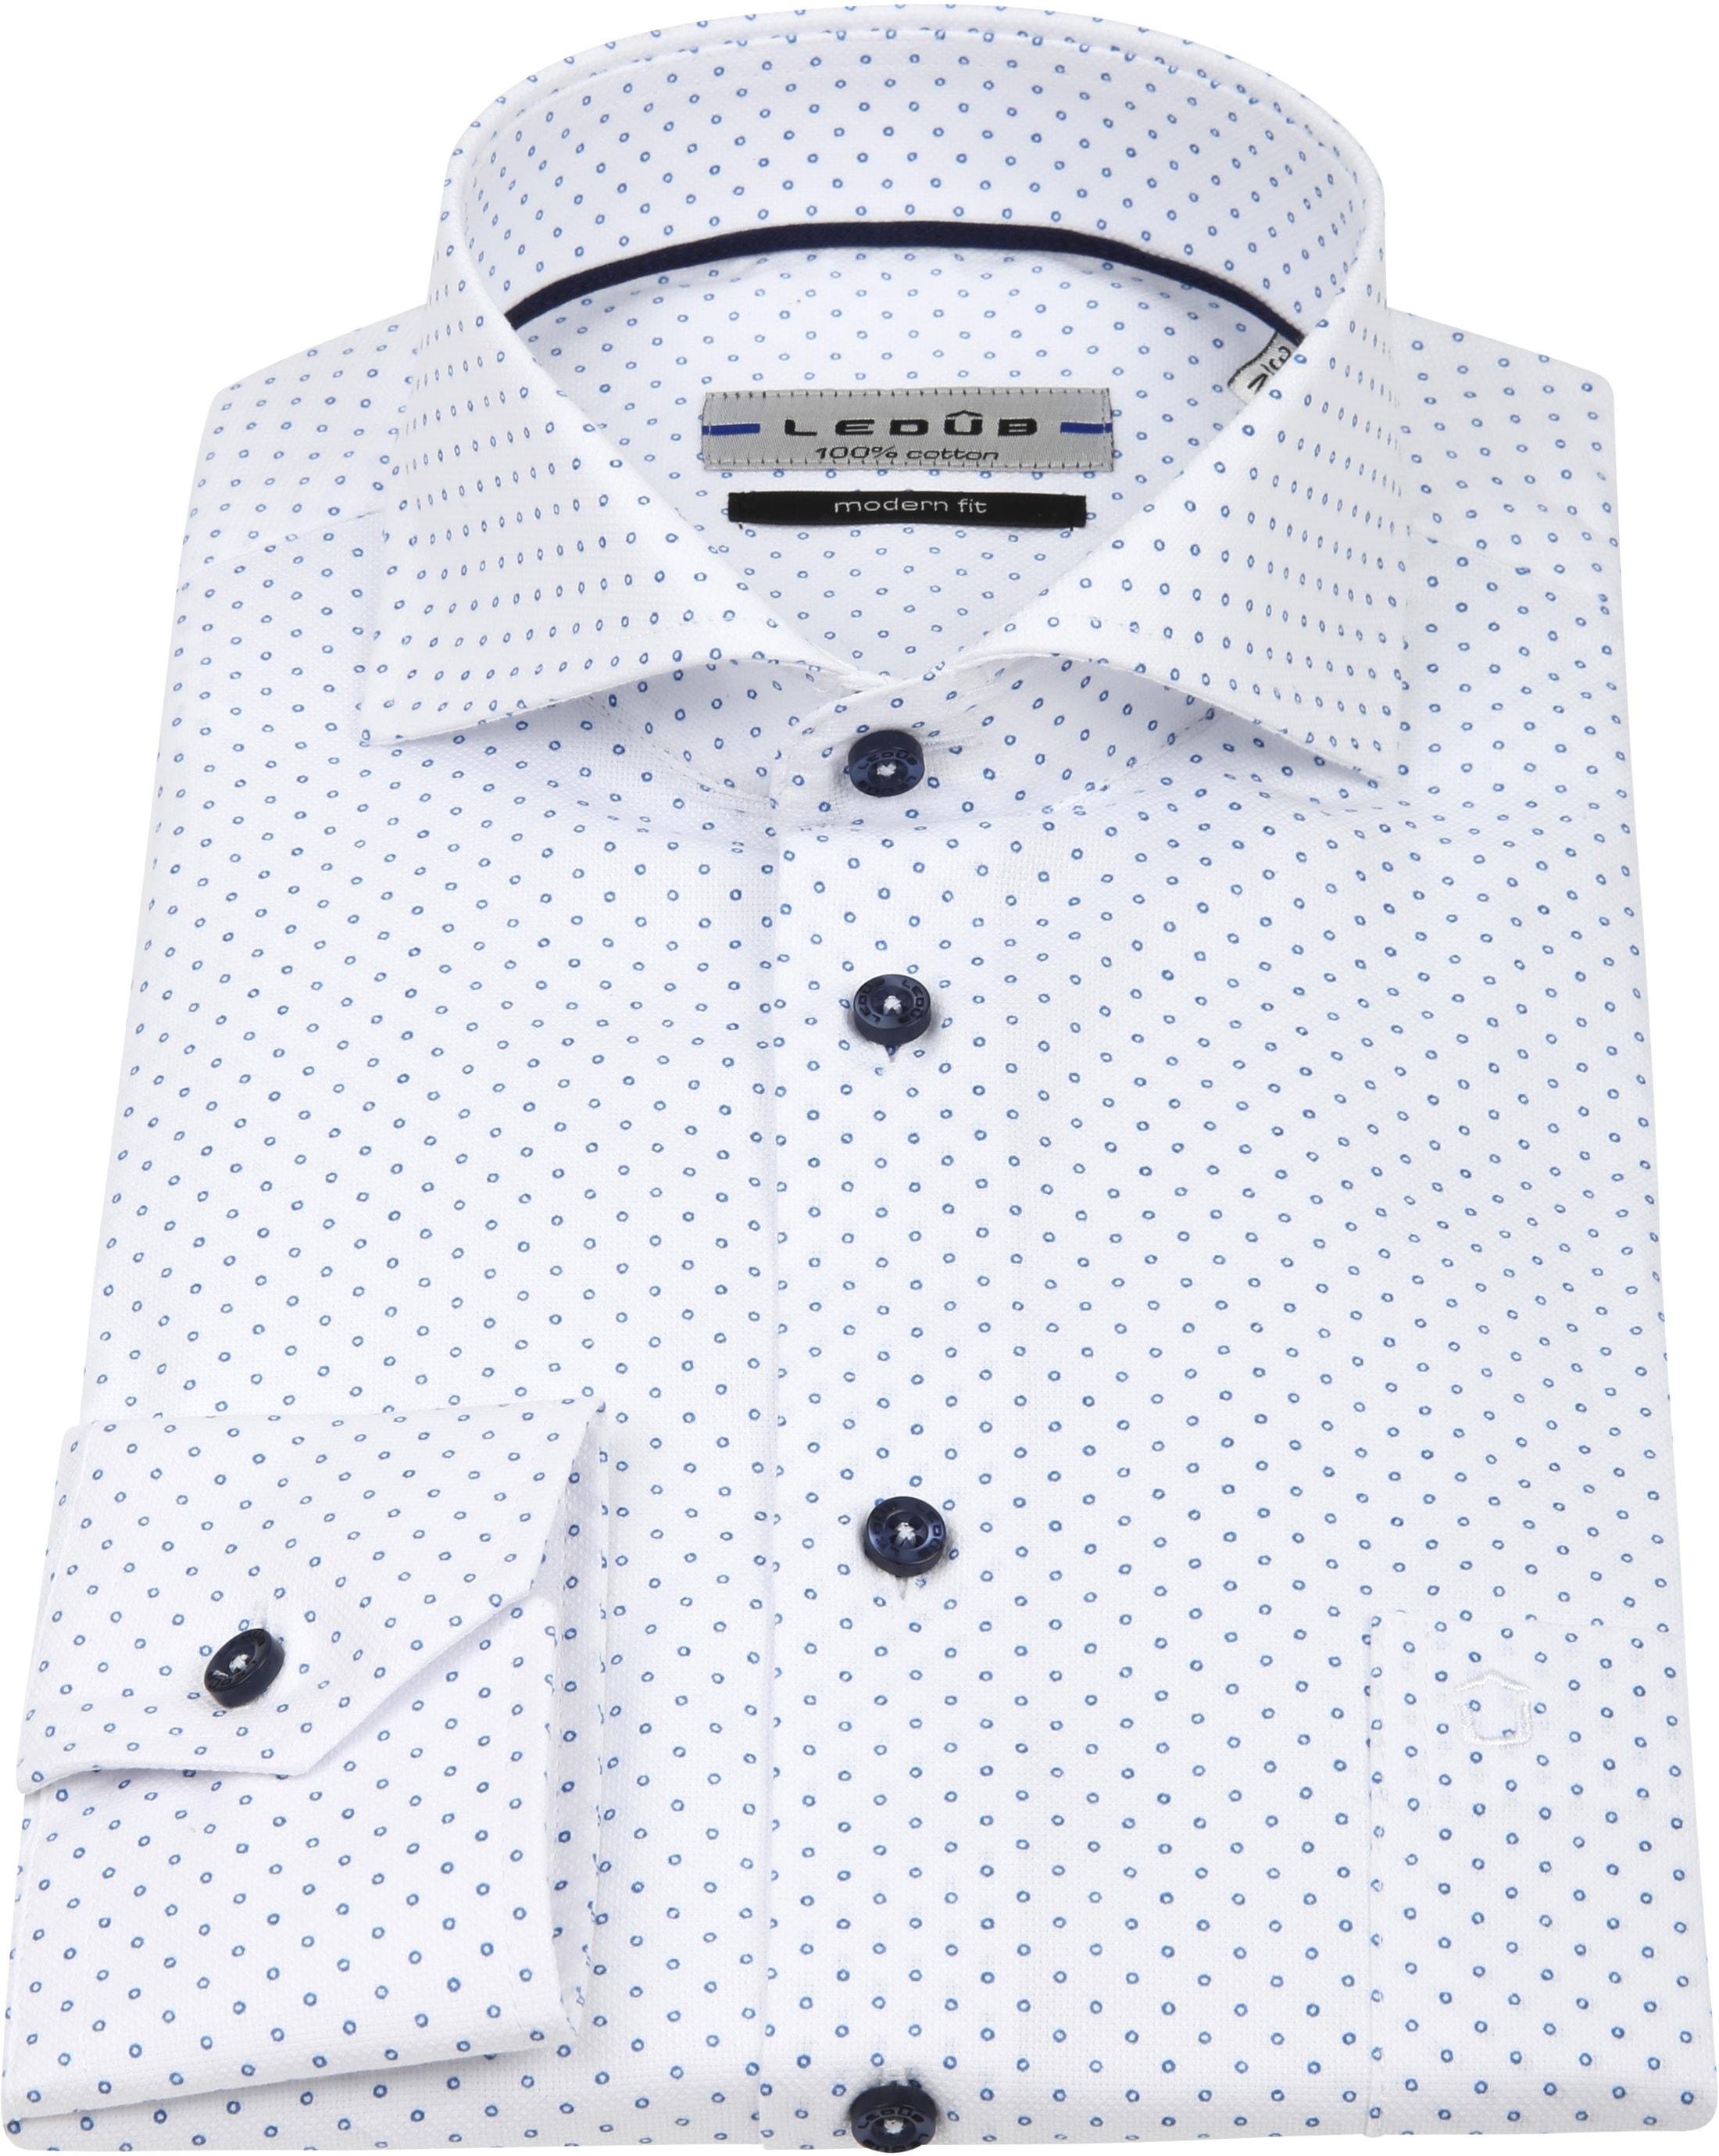 Ledub Overhemd MF Cirkel Wit foto 3